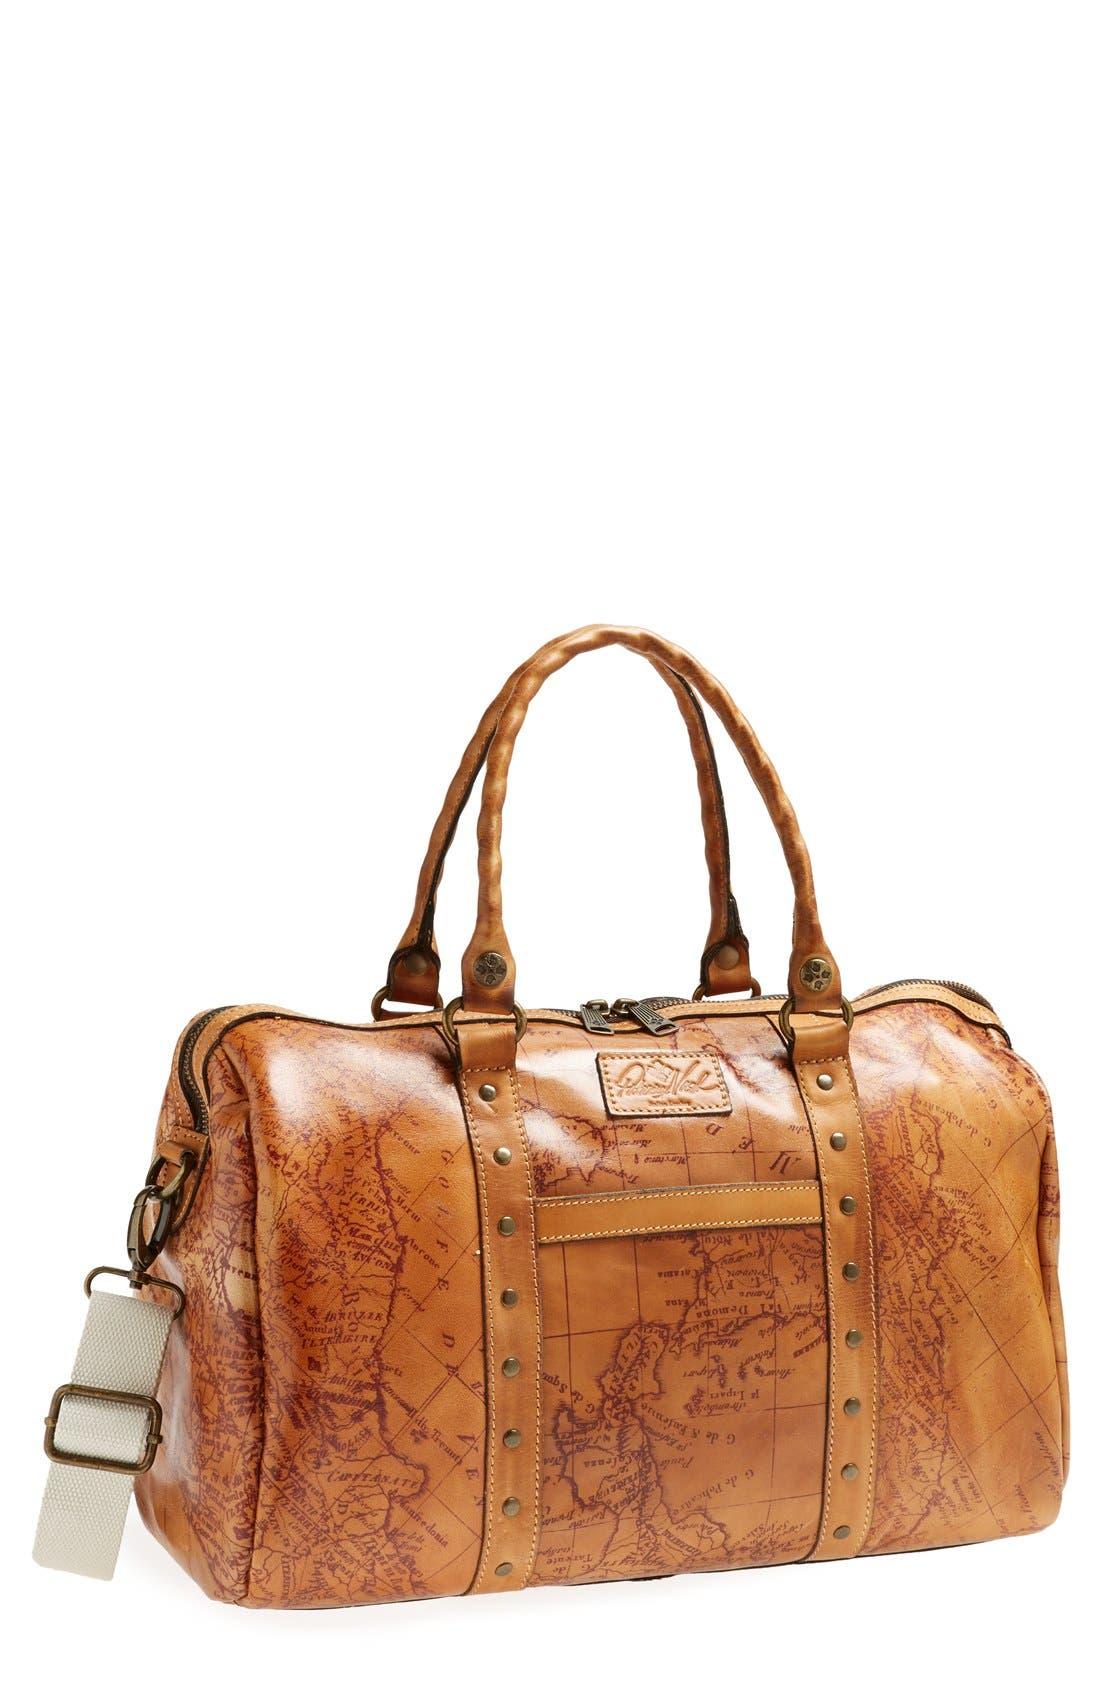 Main Image - Patricia Nash 'Stressa' Leather Overnight Bag (16 Inch)